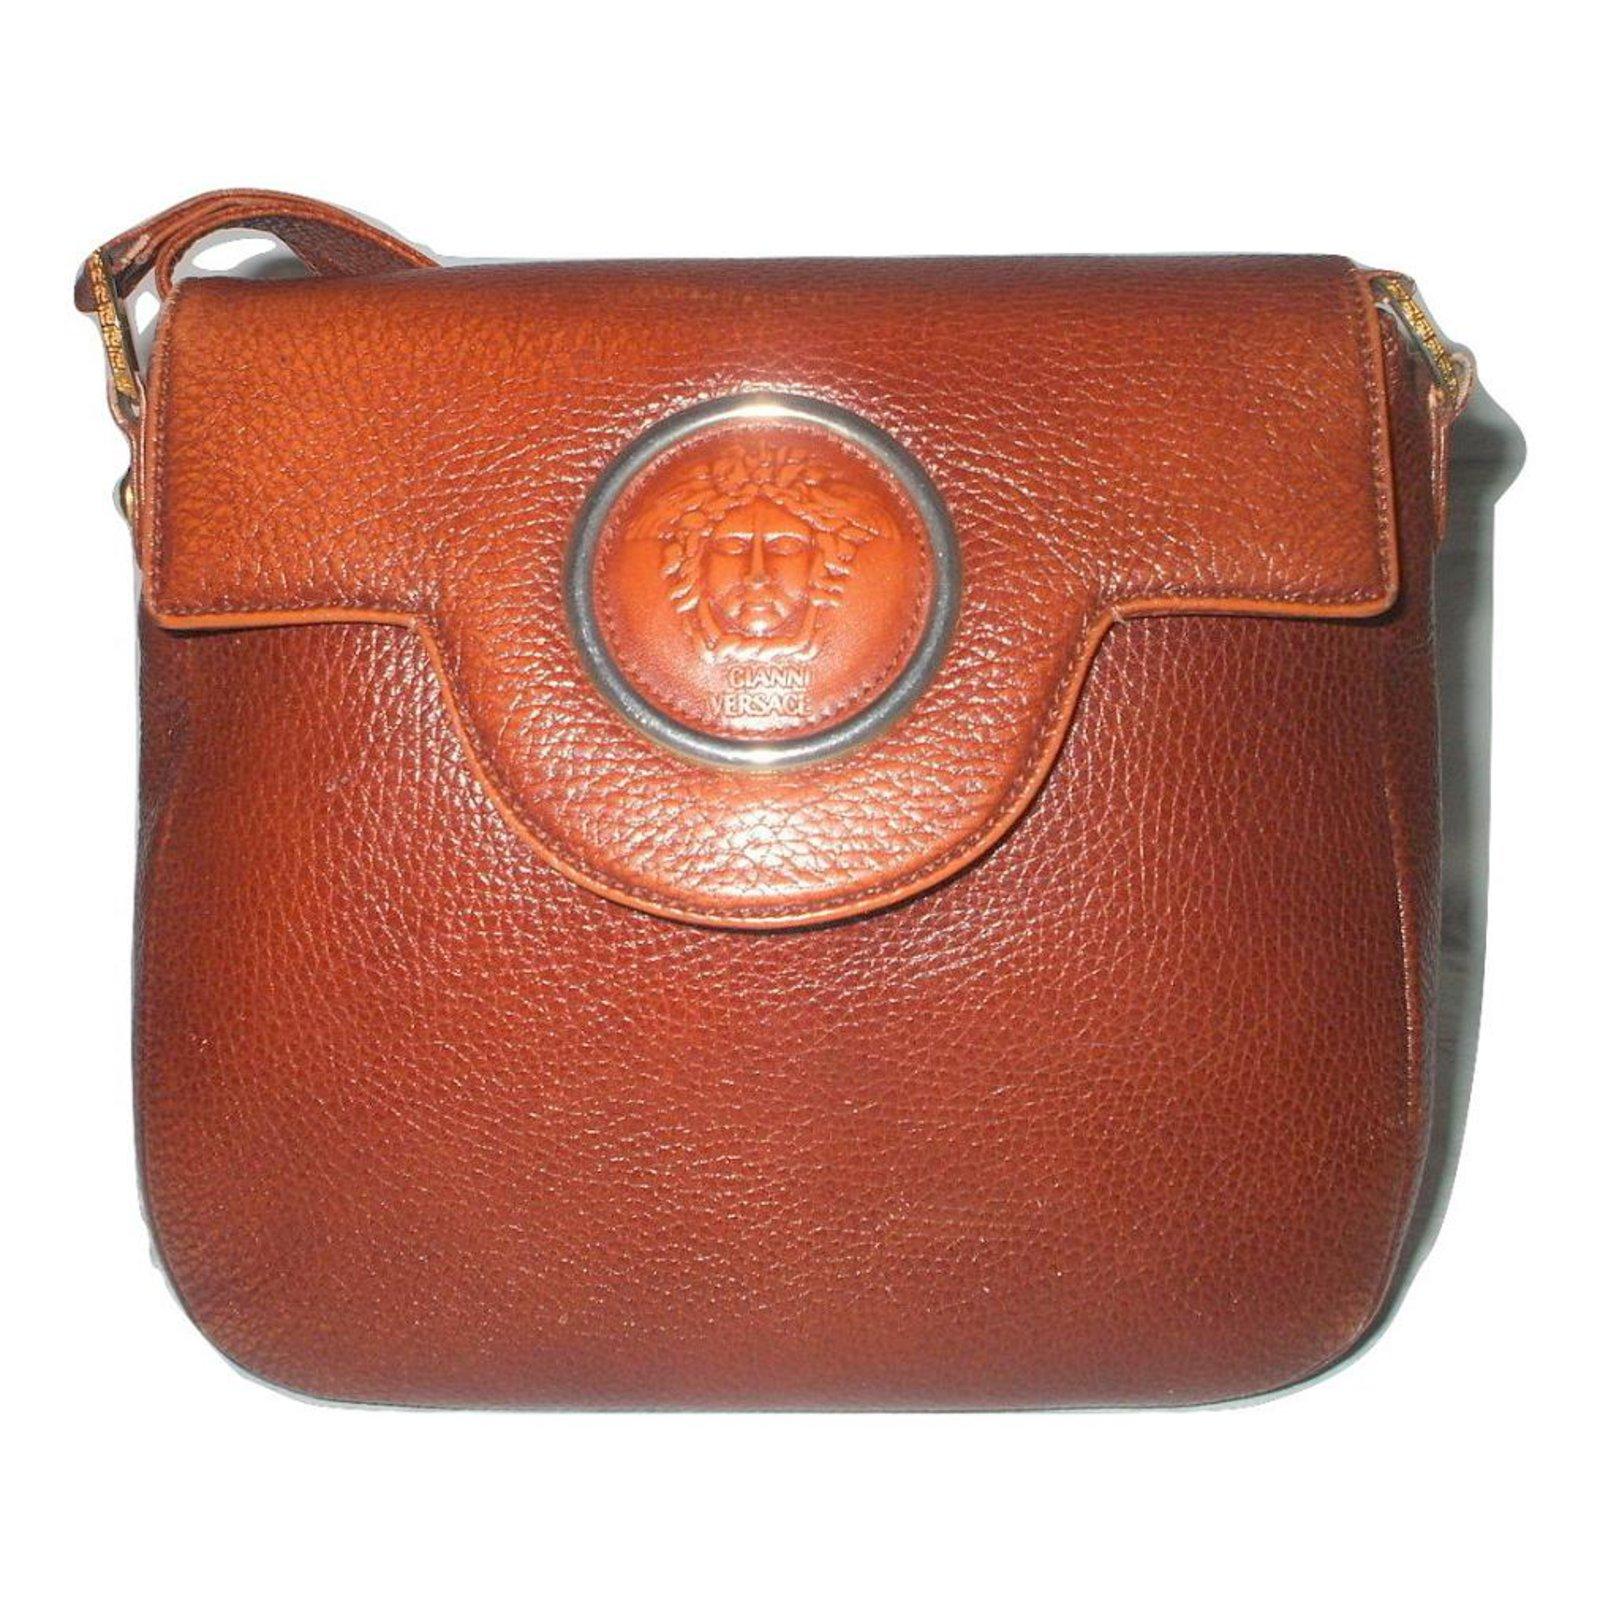 ac31ed9b7a Gianni Versace Vintage Handbags Leather Brown ref.20747 - Joli Closet